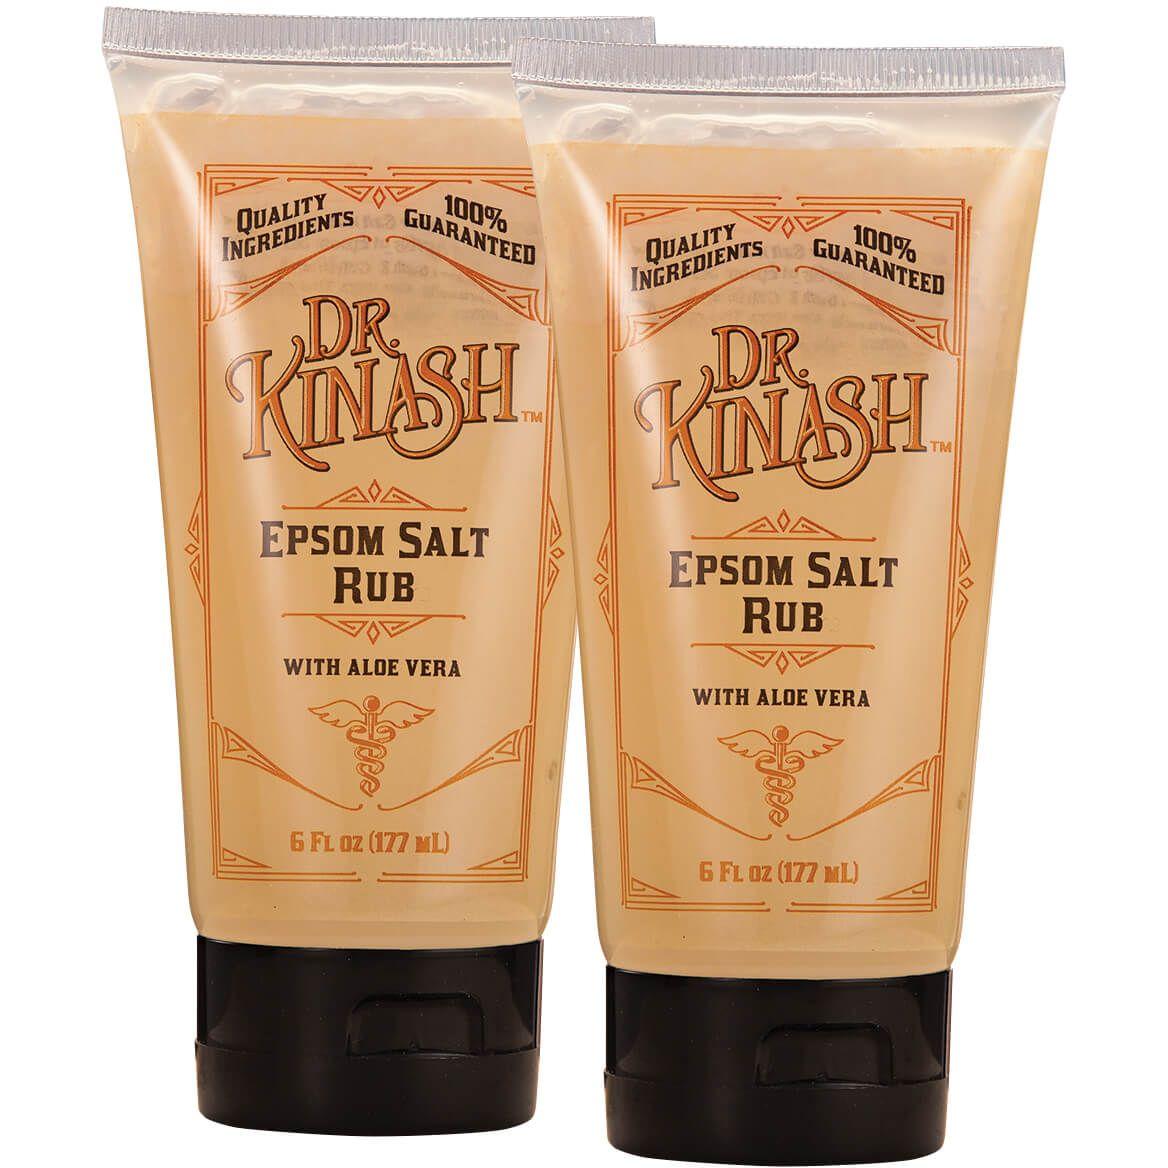 Dr. Kinash™ Epsom Salt Rub 6 oz., Set of 2-368909